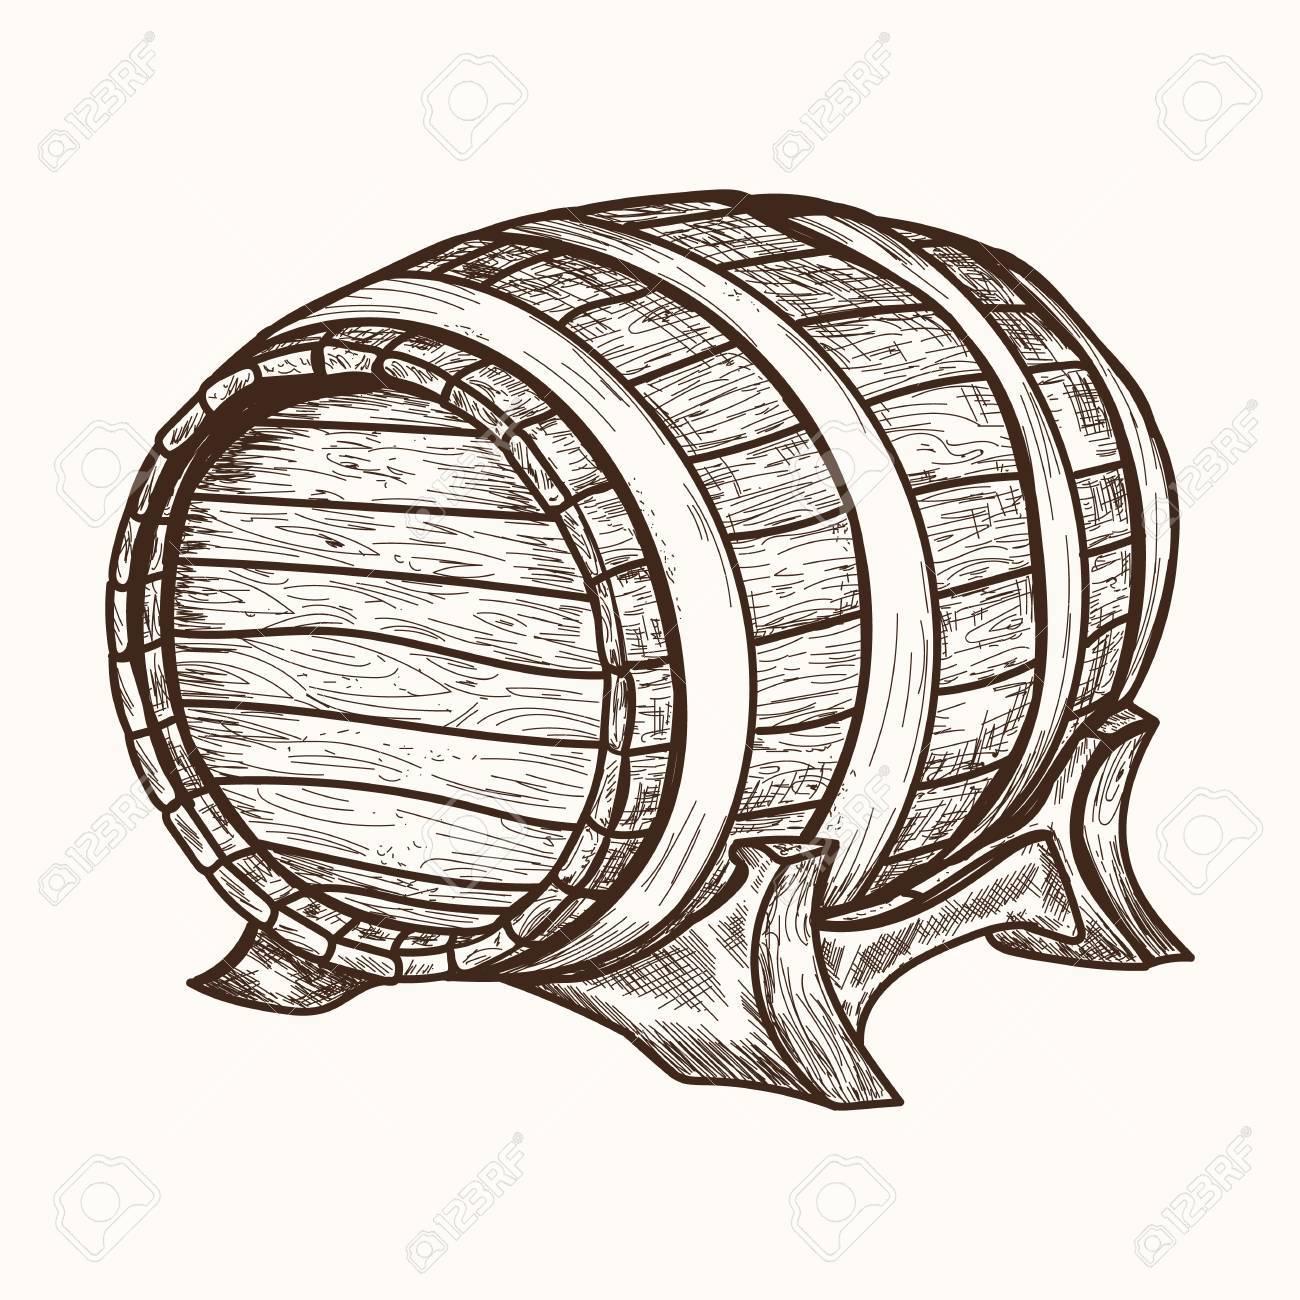 1300x1300 Wooden Barrel. Hand Drawn Retro Vintage Illustration, Engraved